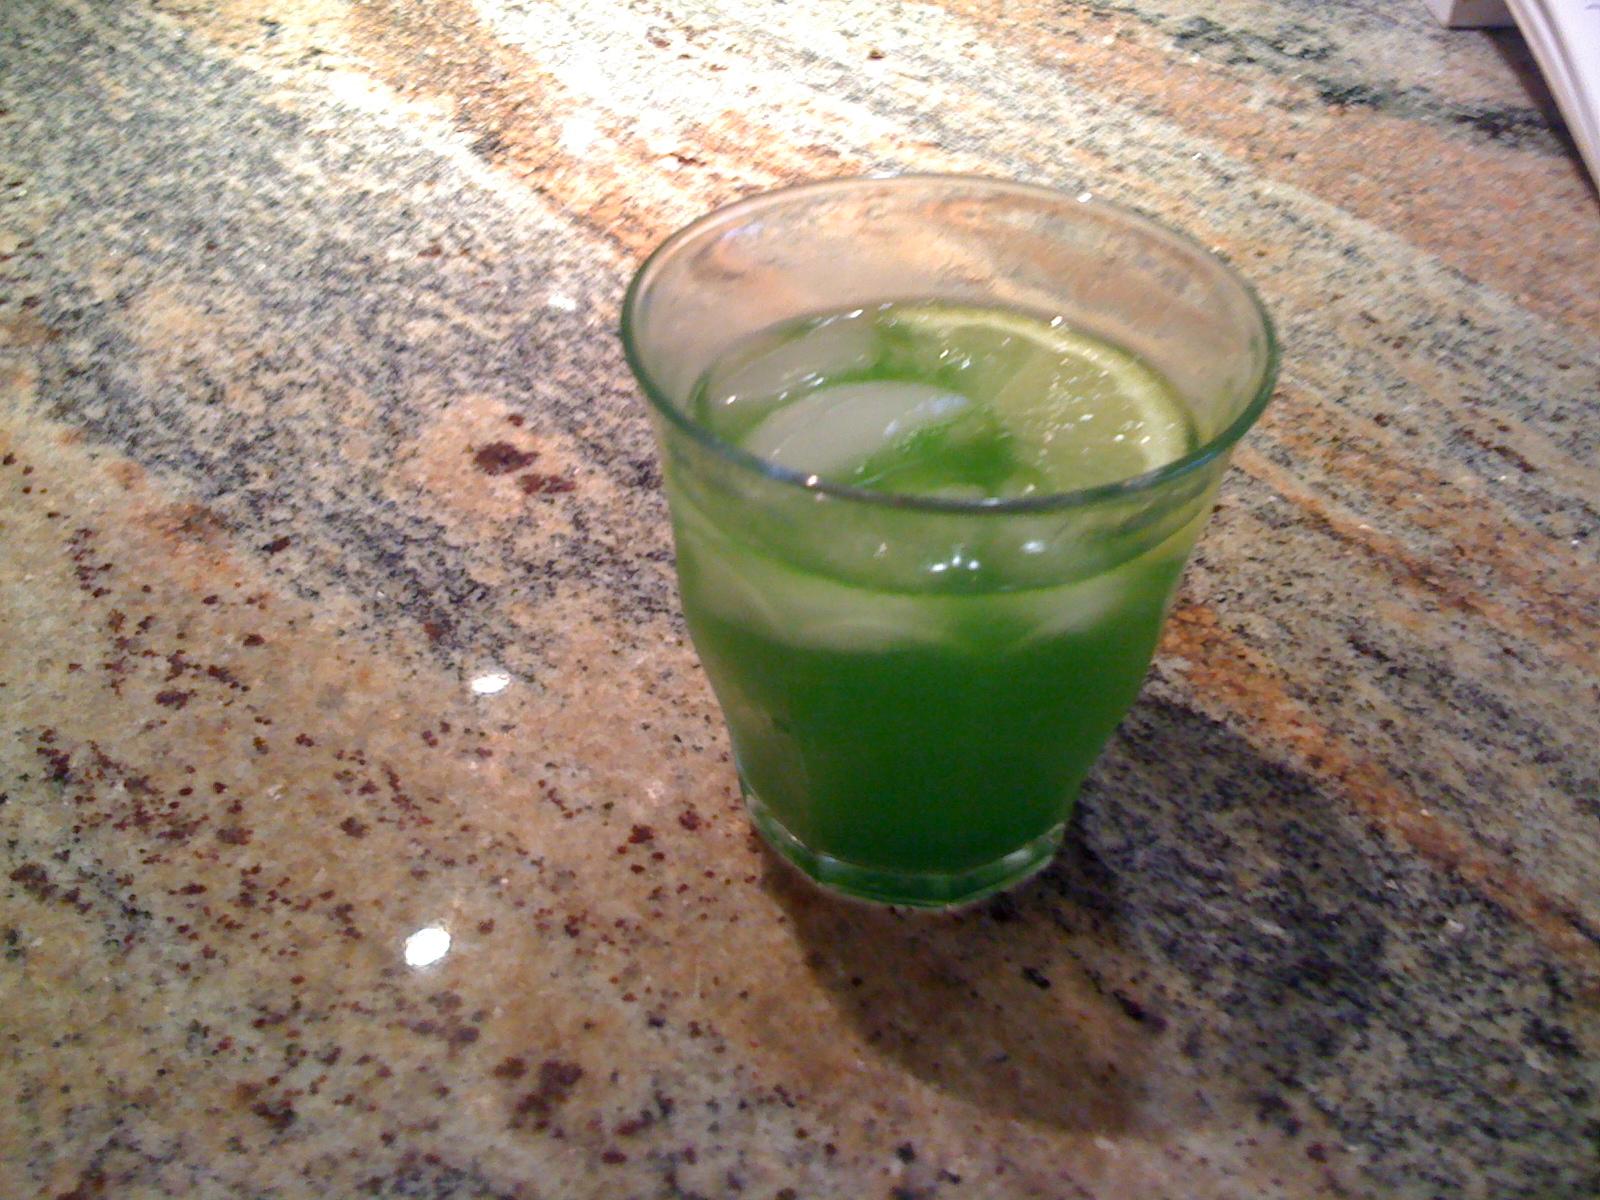 http://4.bp.blogspot.com/-5ux_9OlD14I/T-t_Ri1zxEI/AAAAAAAAEi8/9KA4klSAL1U/s1600/Green+drink.jpg